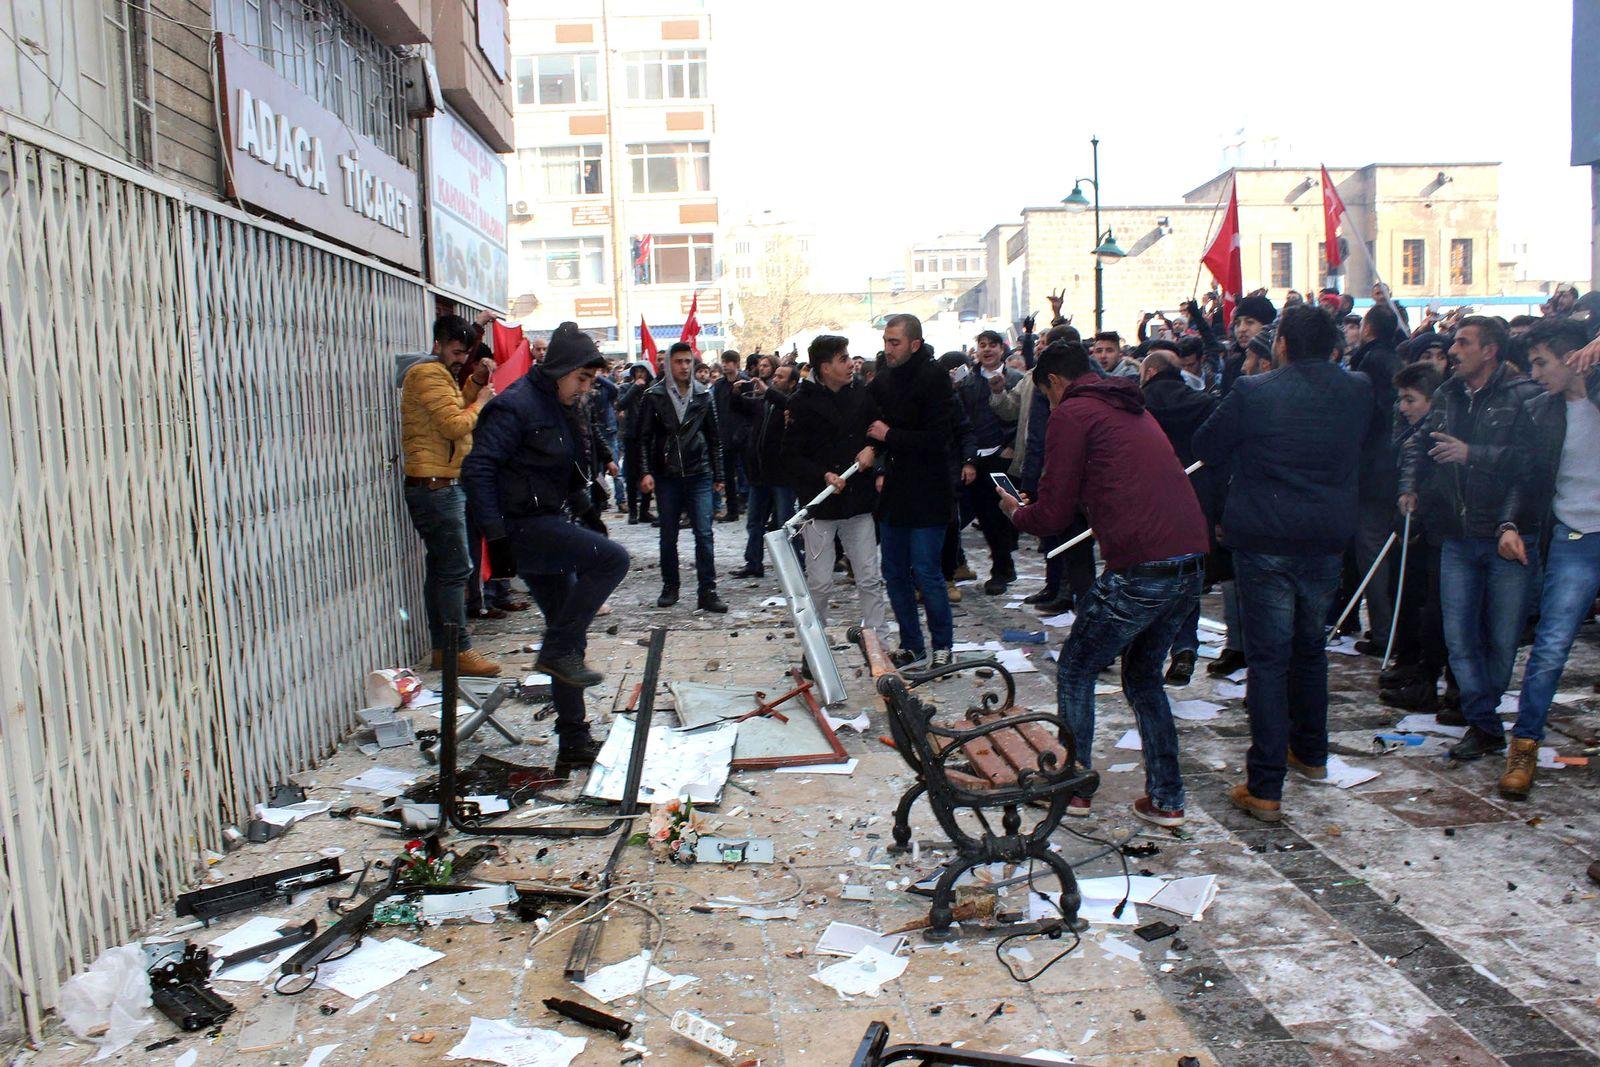 Türkei/ Kayseri/ Bombenanschlag/ Proteste